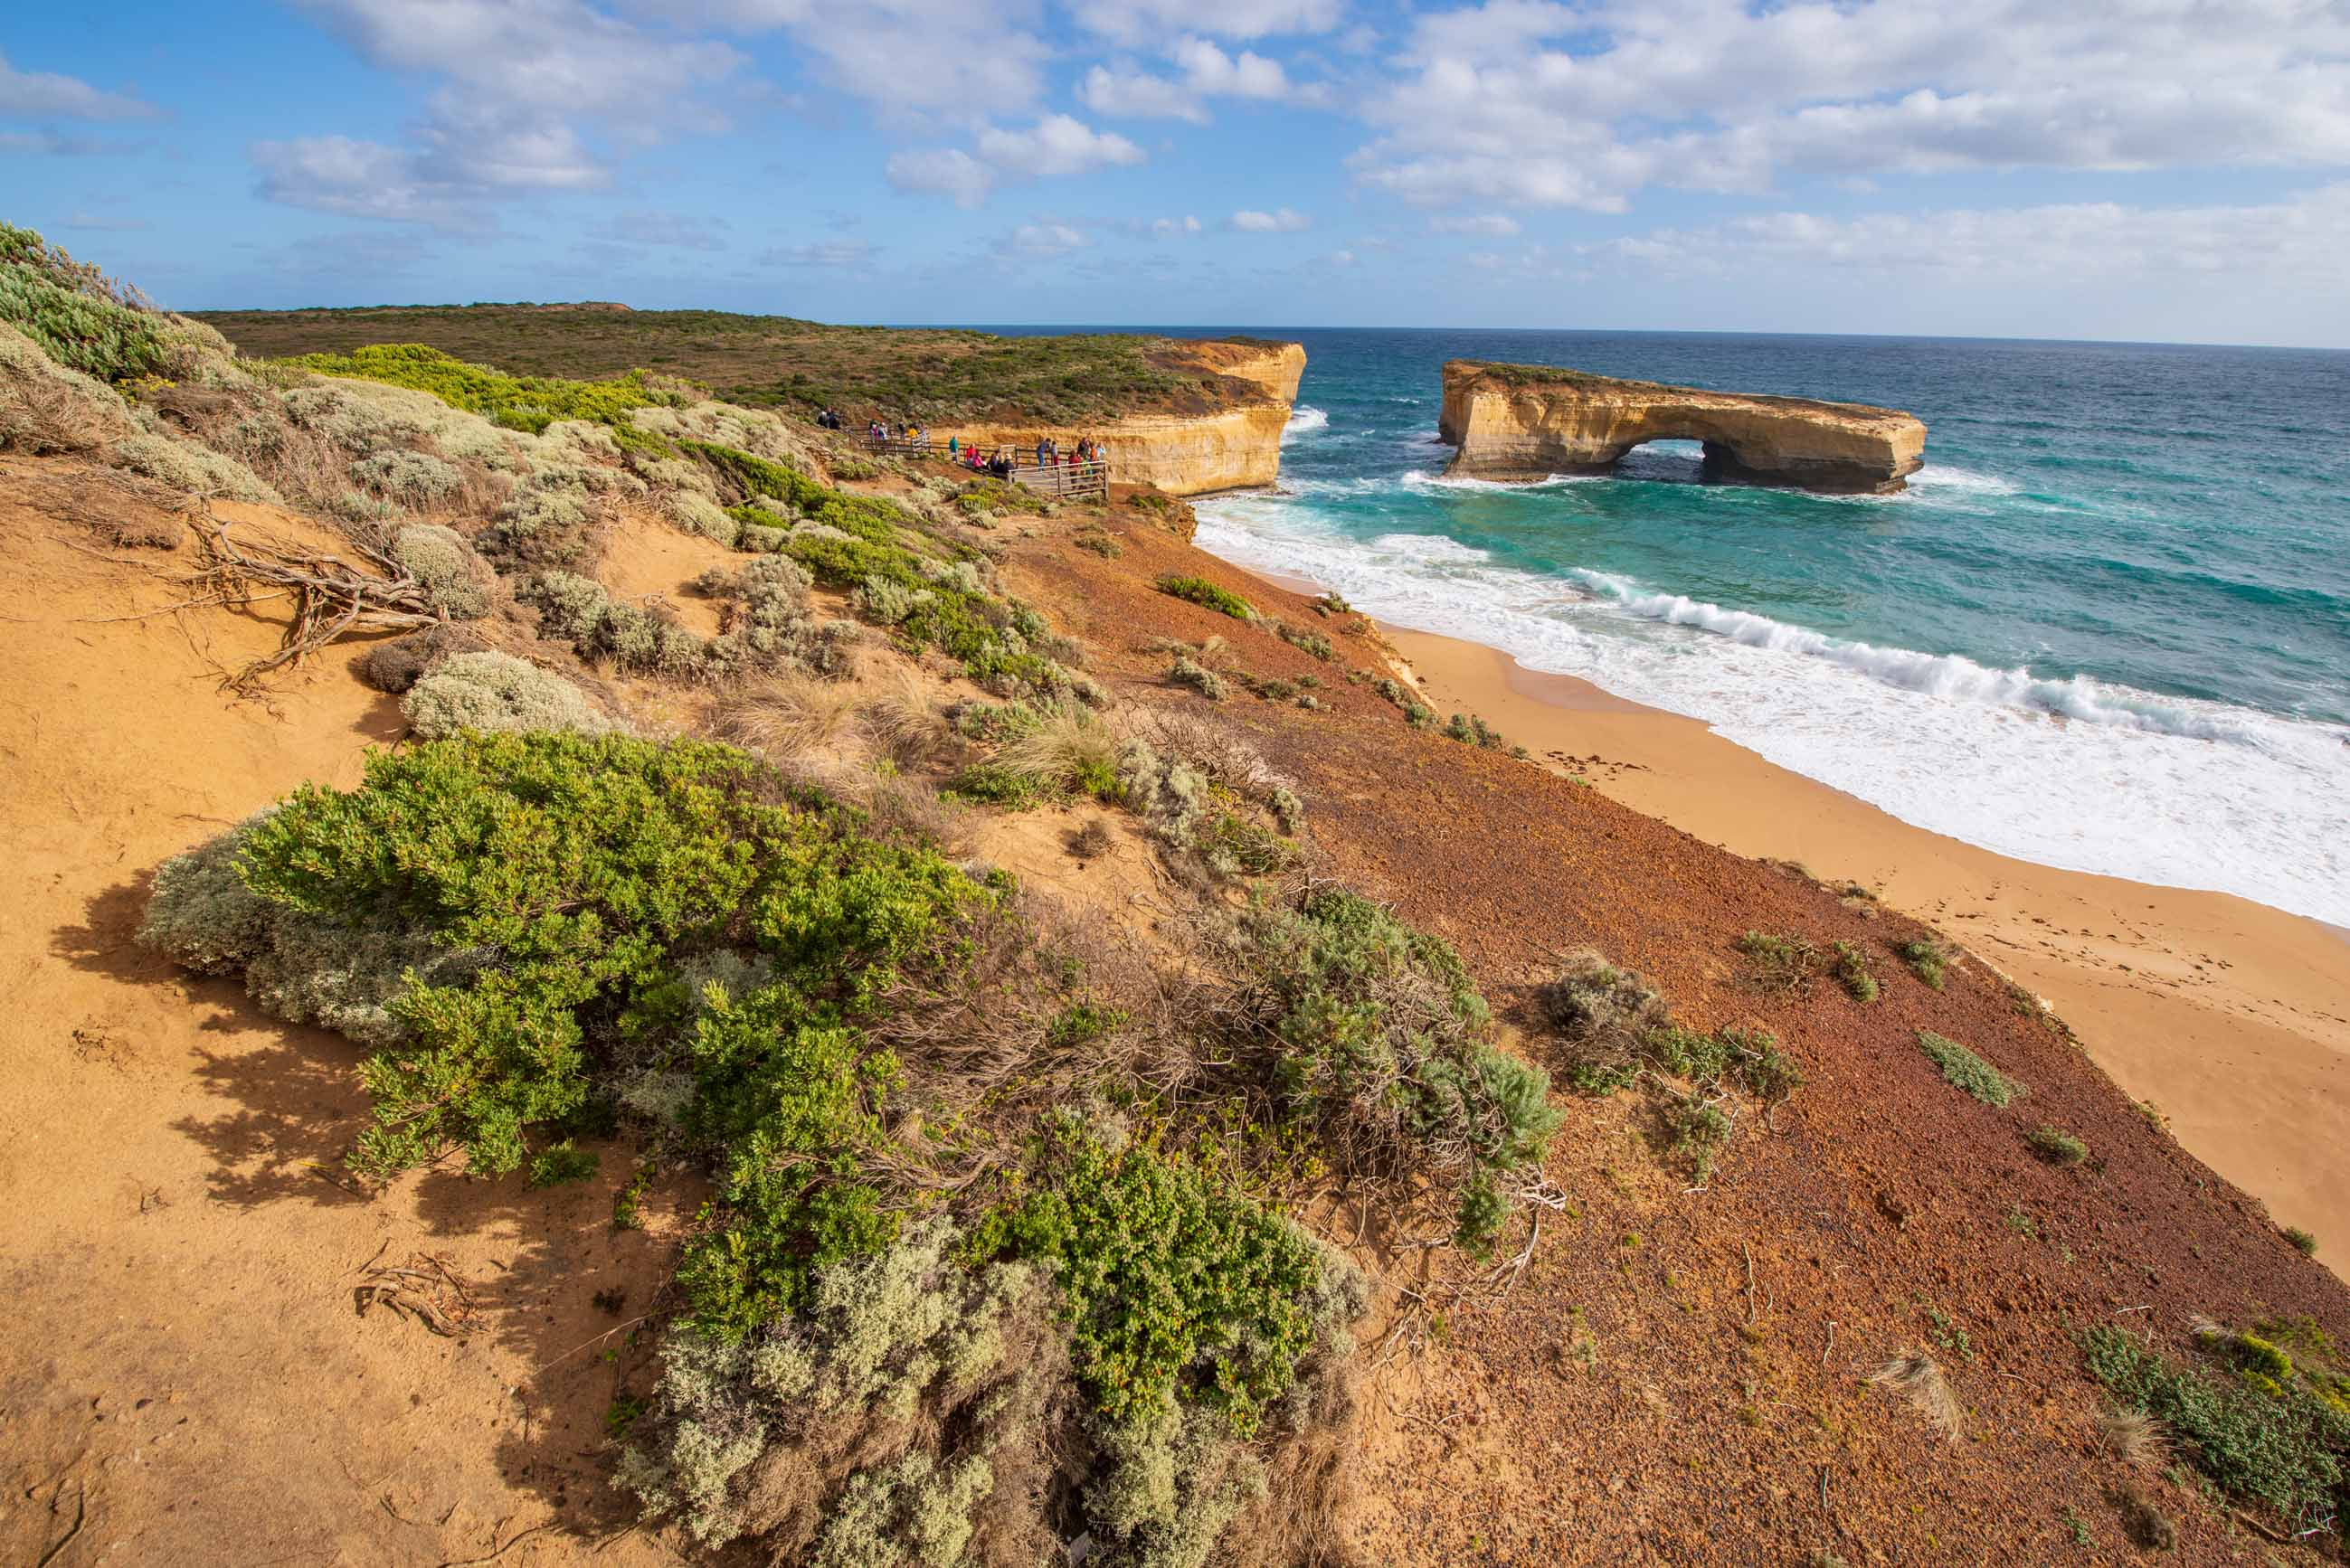 https://bubo.sk/uploads/galleries/5027/roberttaraba_australia_greatoceanroad5.jpg